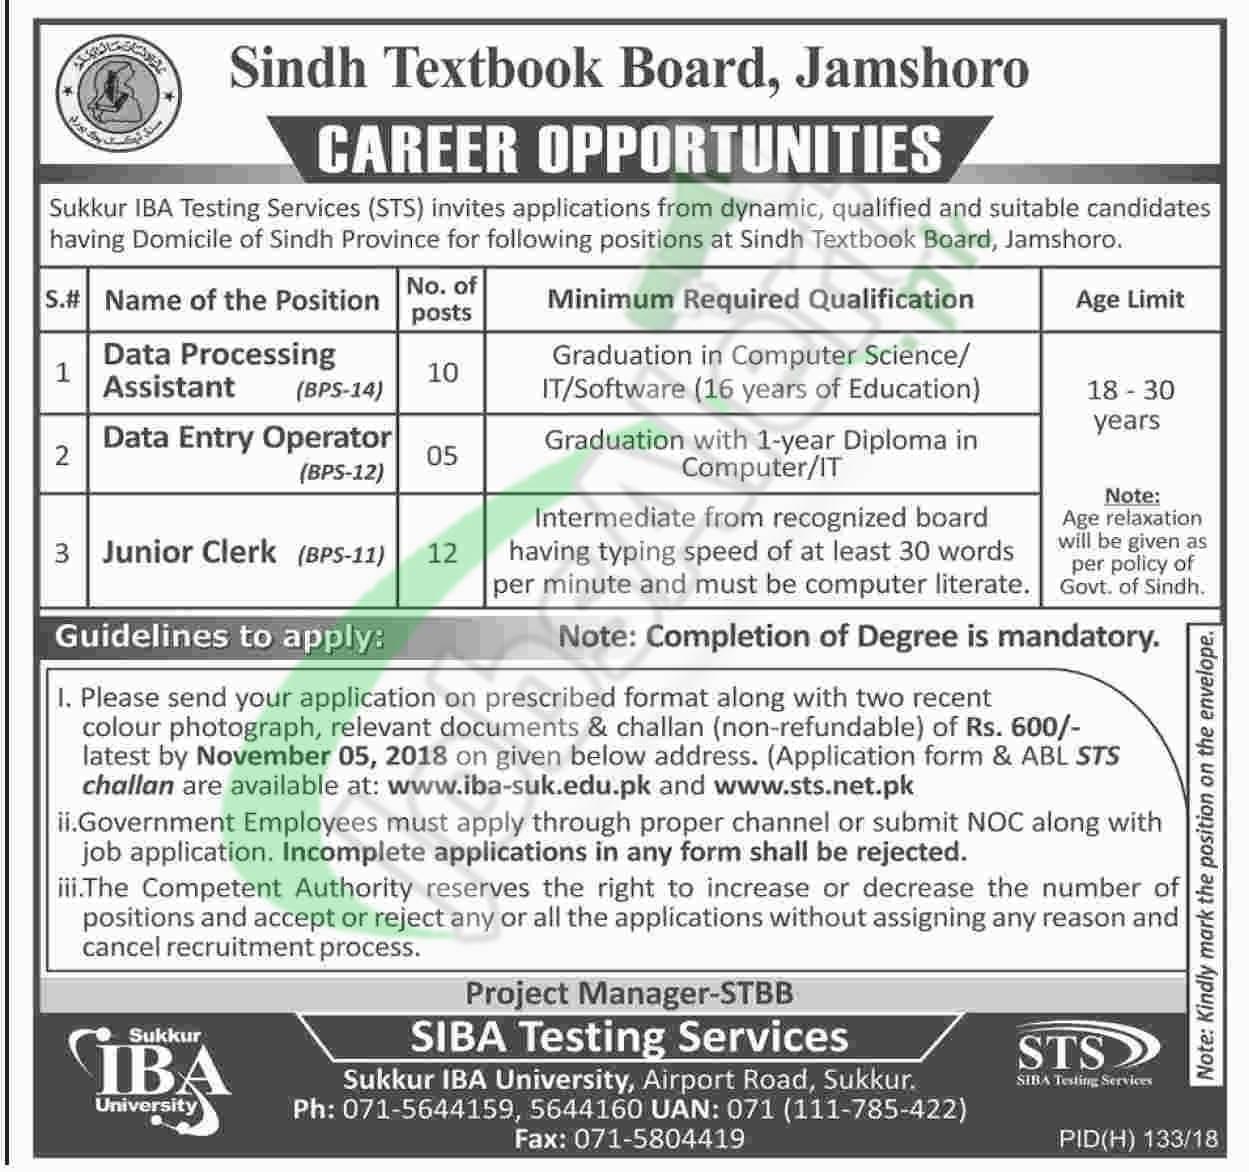 Sindh Textbook Board Jamshoro Jobs 2018